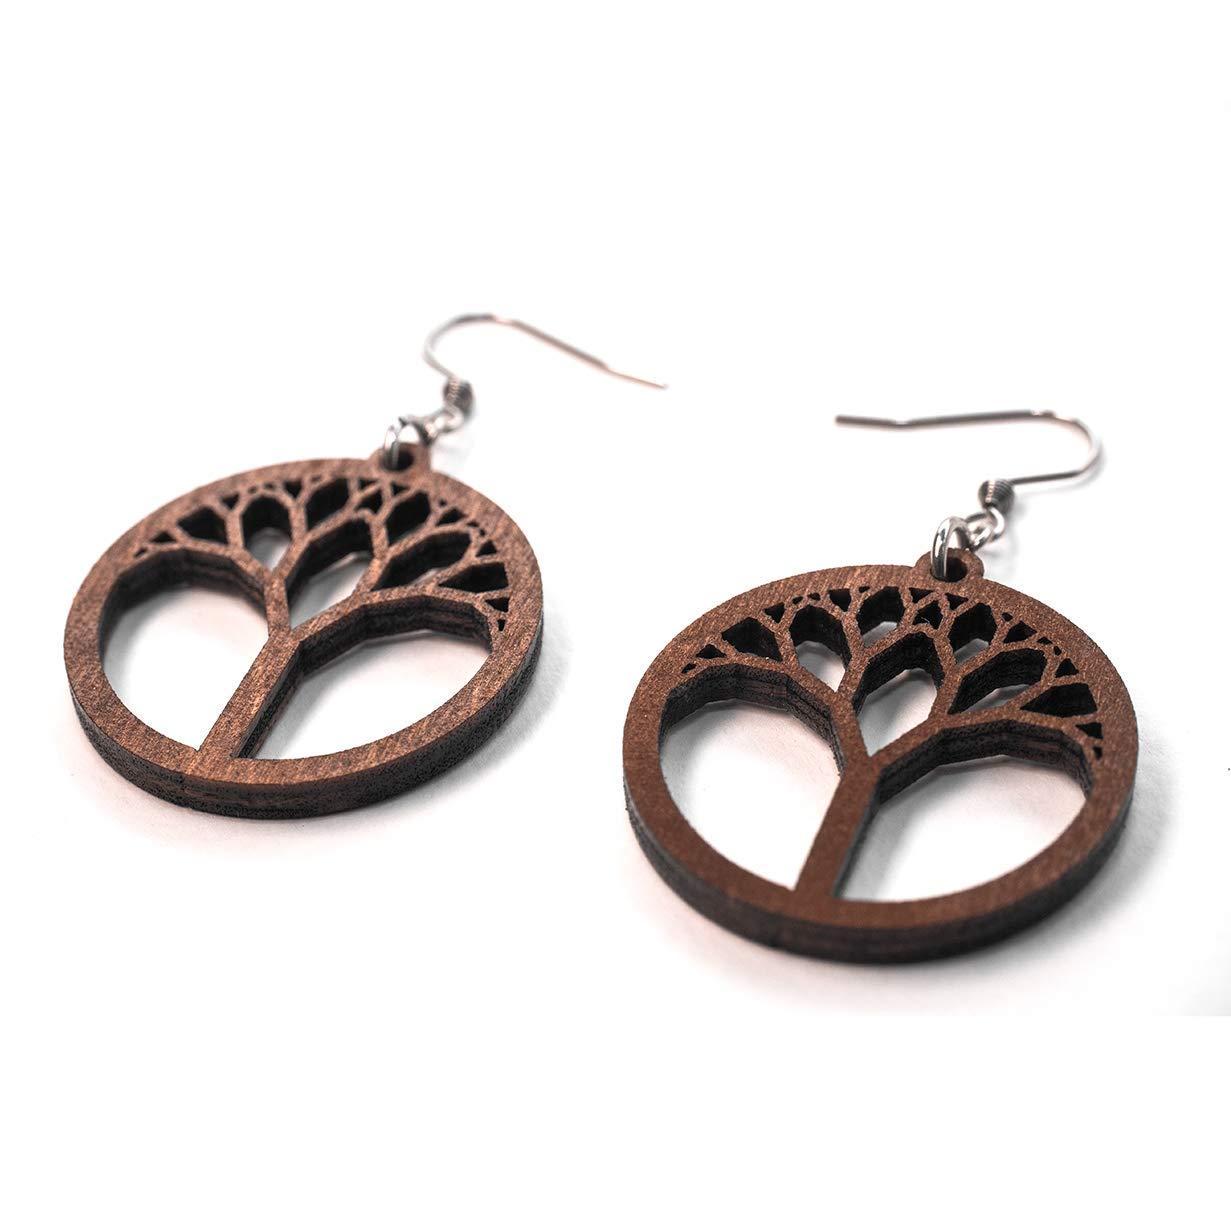 A pair of wooden leafs wooden earrings for women wood earrings dangling large hoop earrings handmade earrings gift wooden hoops